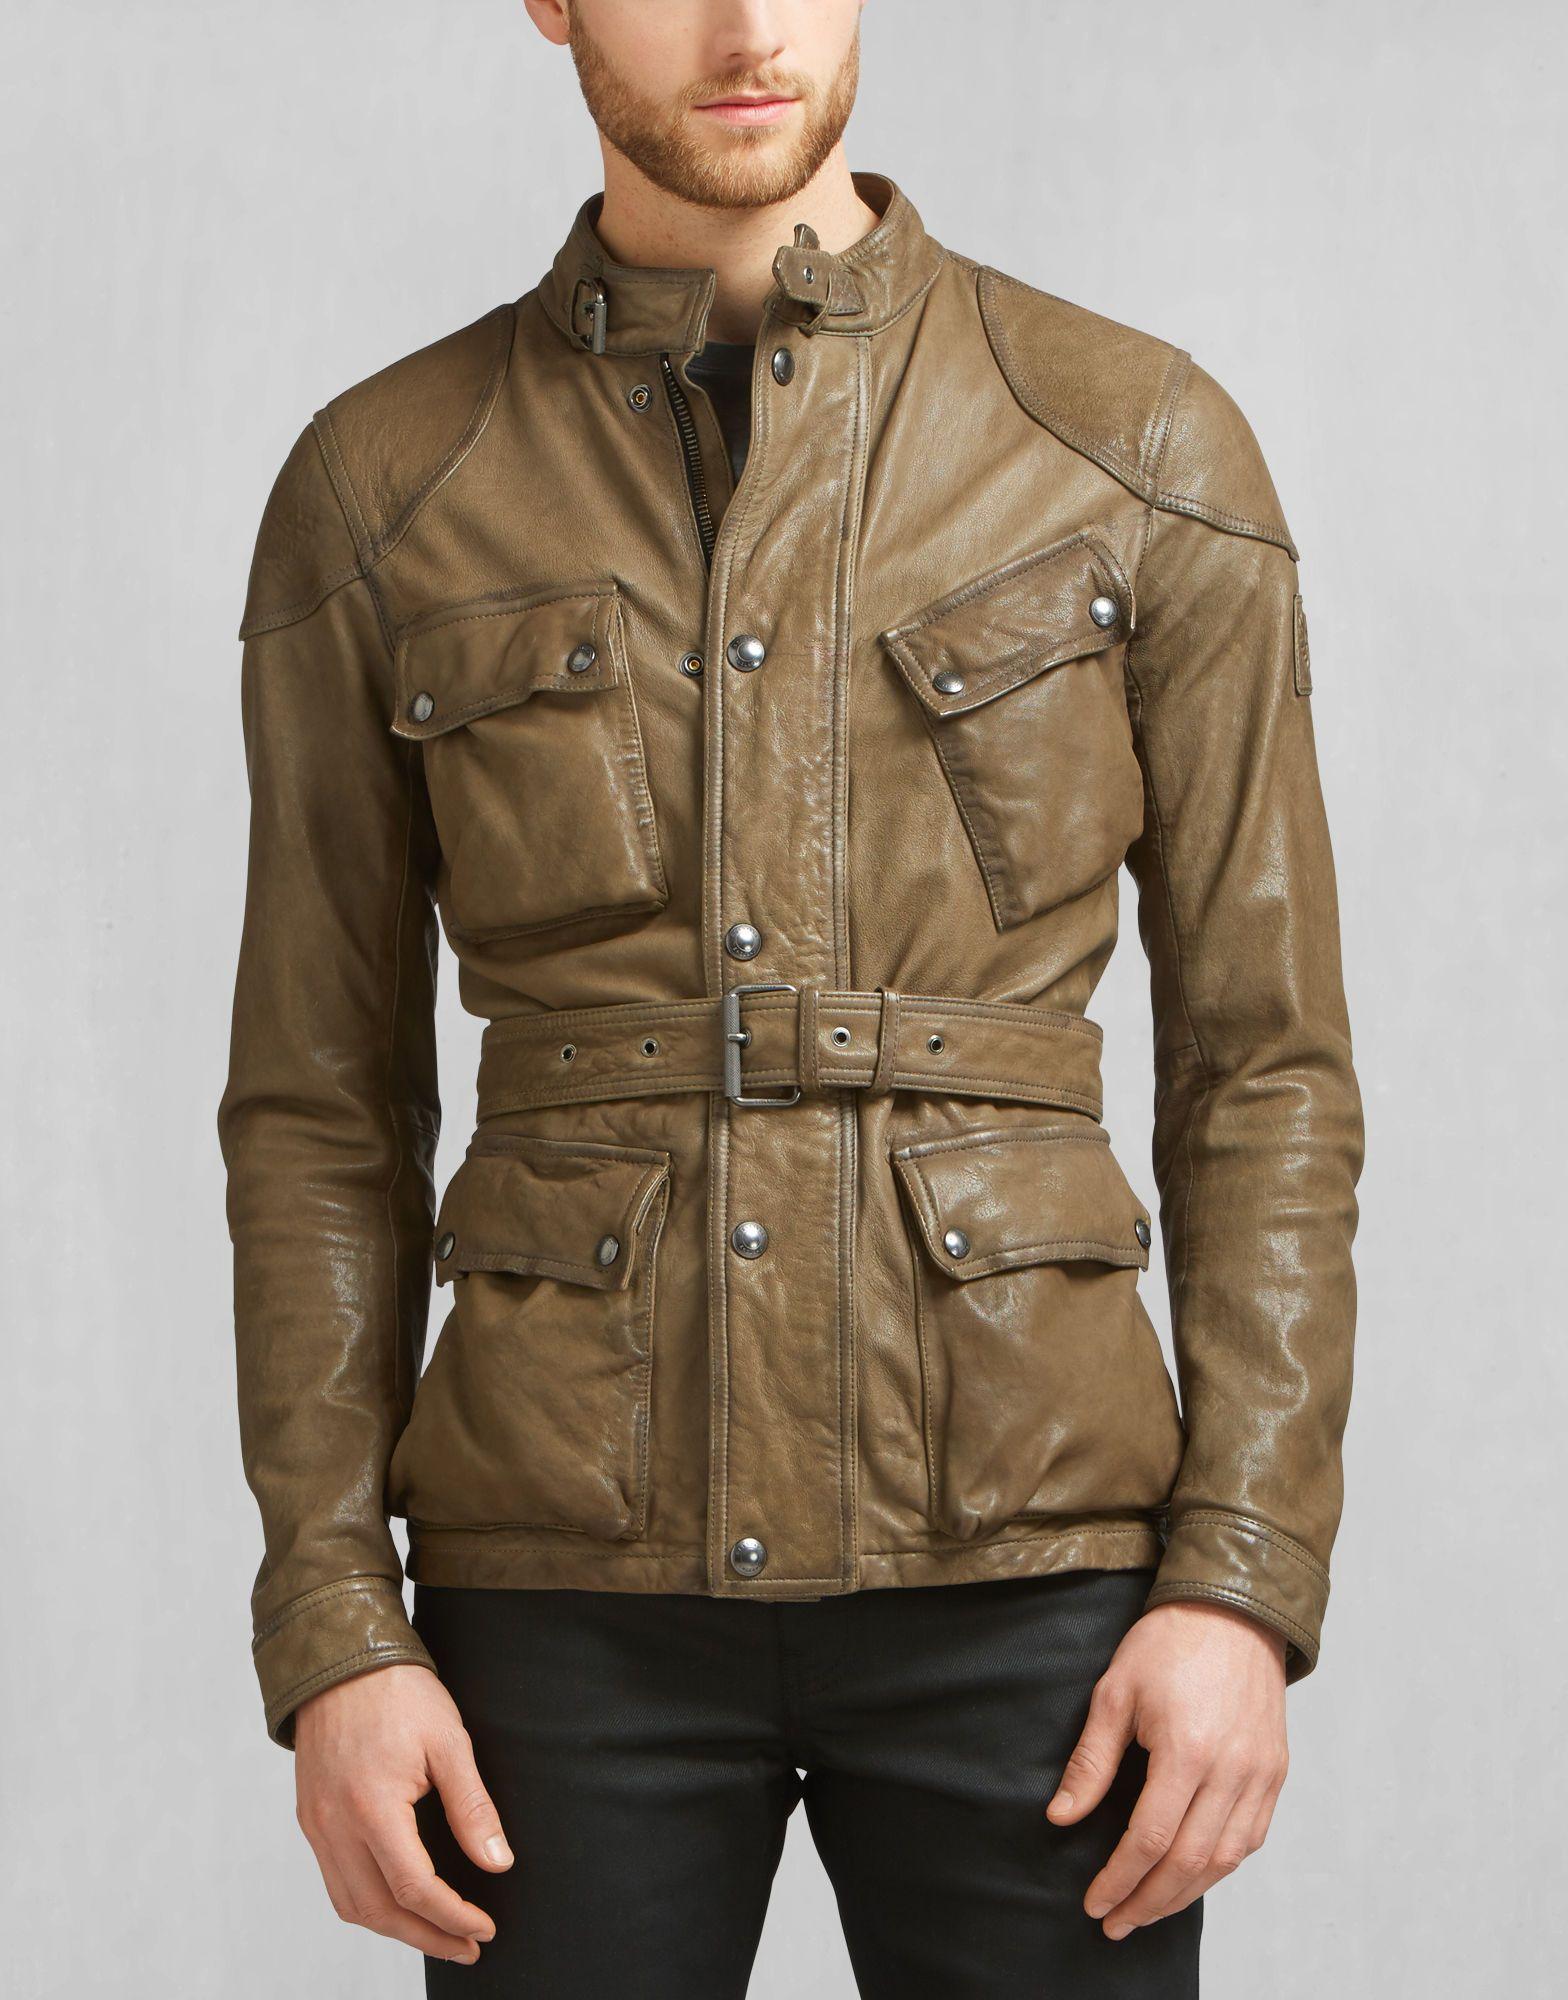 Belstaff Replica Leather